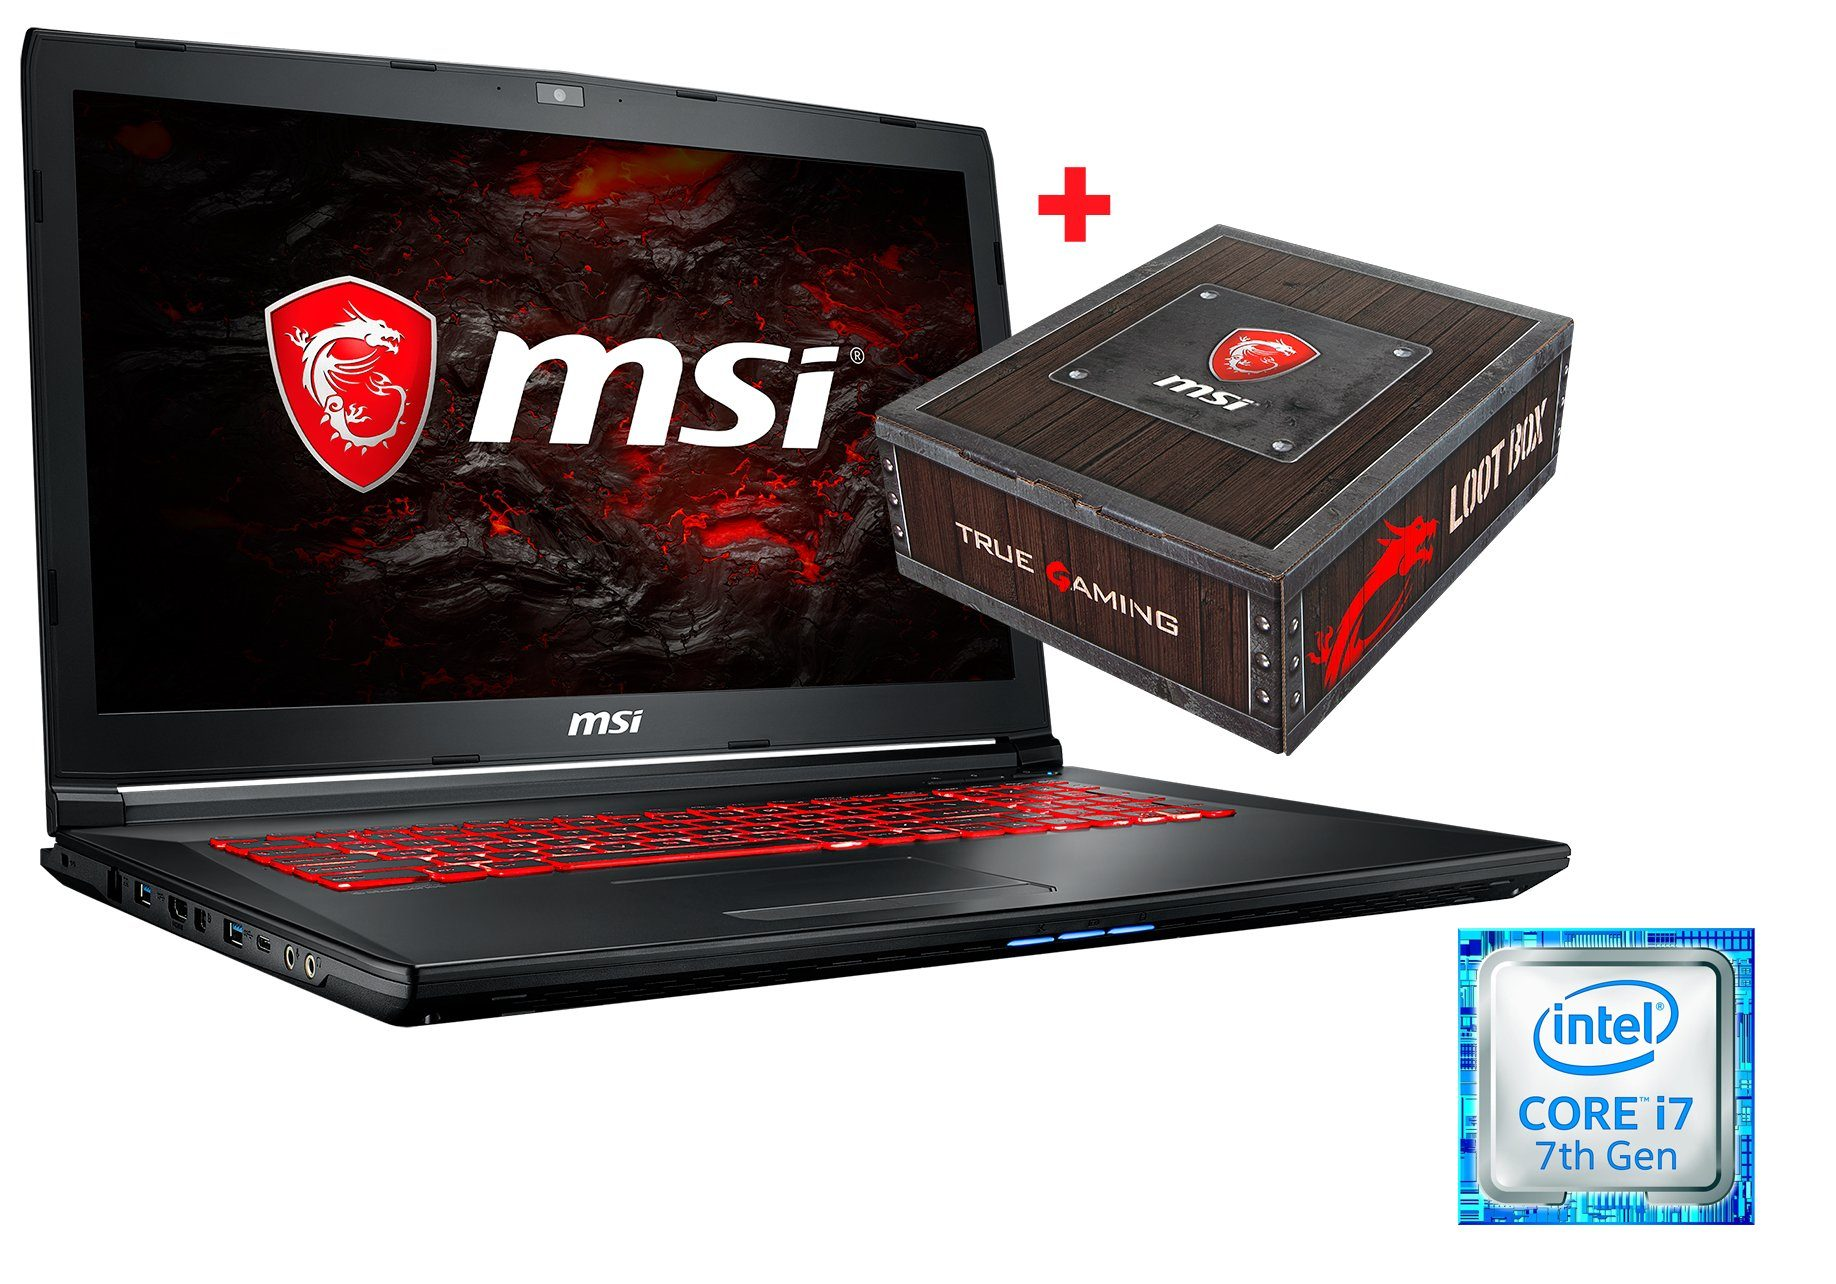 "MSI 17,3"", i7-7700HQ, 16GB, SSD + HDD, GeForce® GTX 1050 TI »GL72M 7REX-1056DE (001799-1056)«"